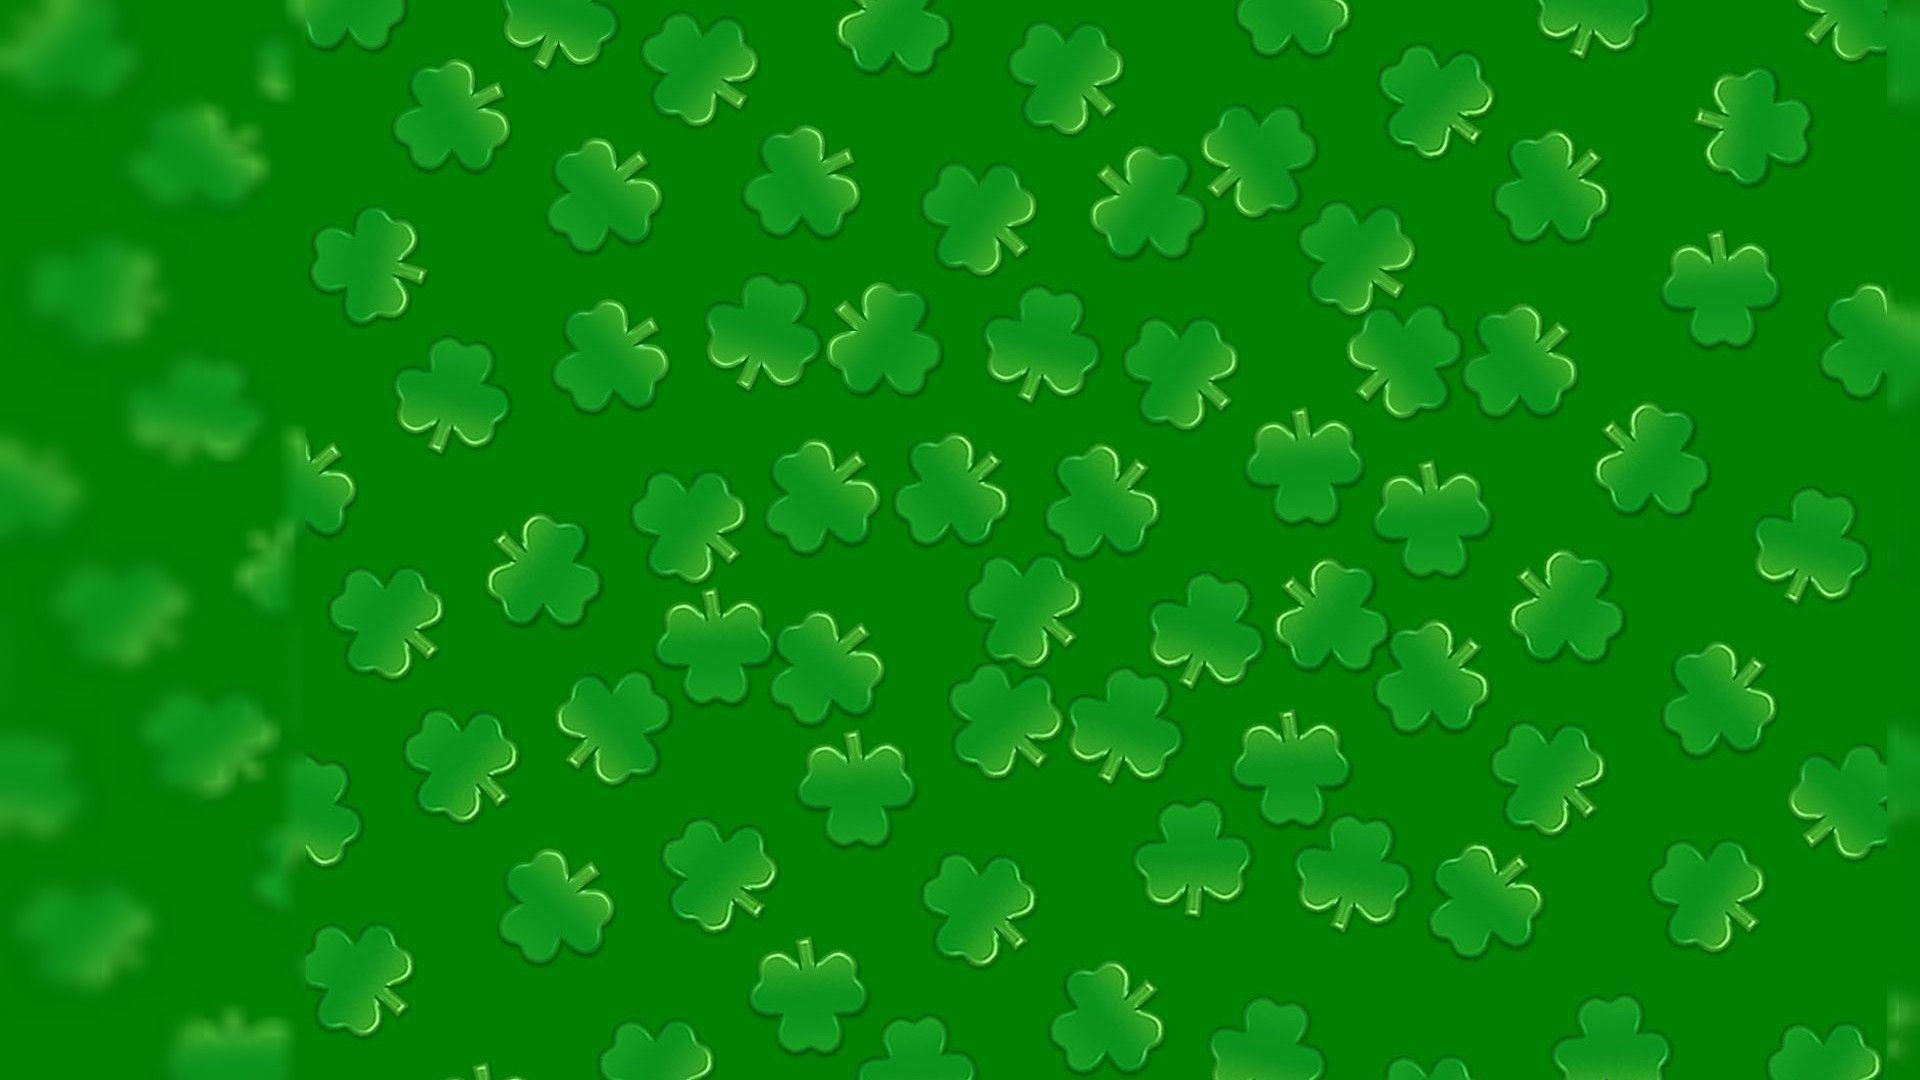 St Patricks Day Desktop Wallpapers 1920x1080